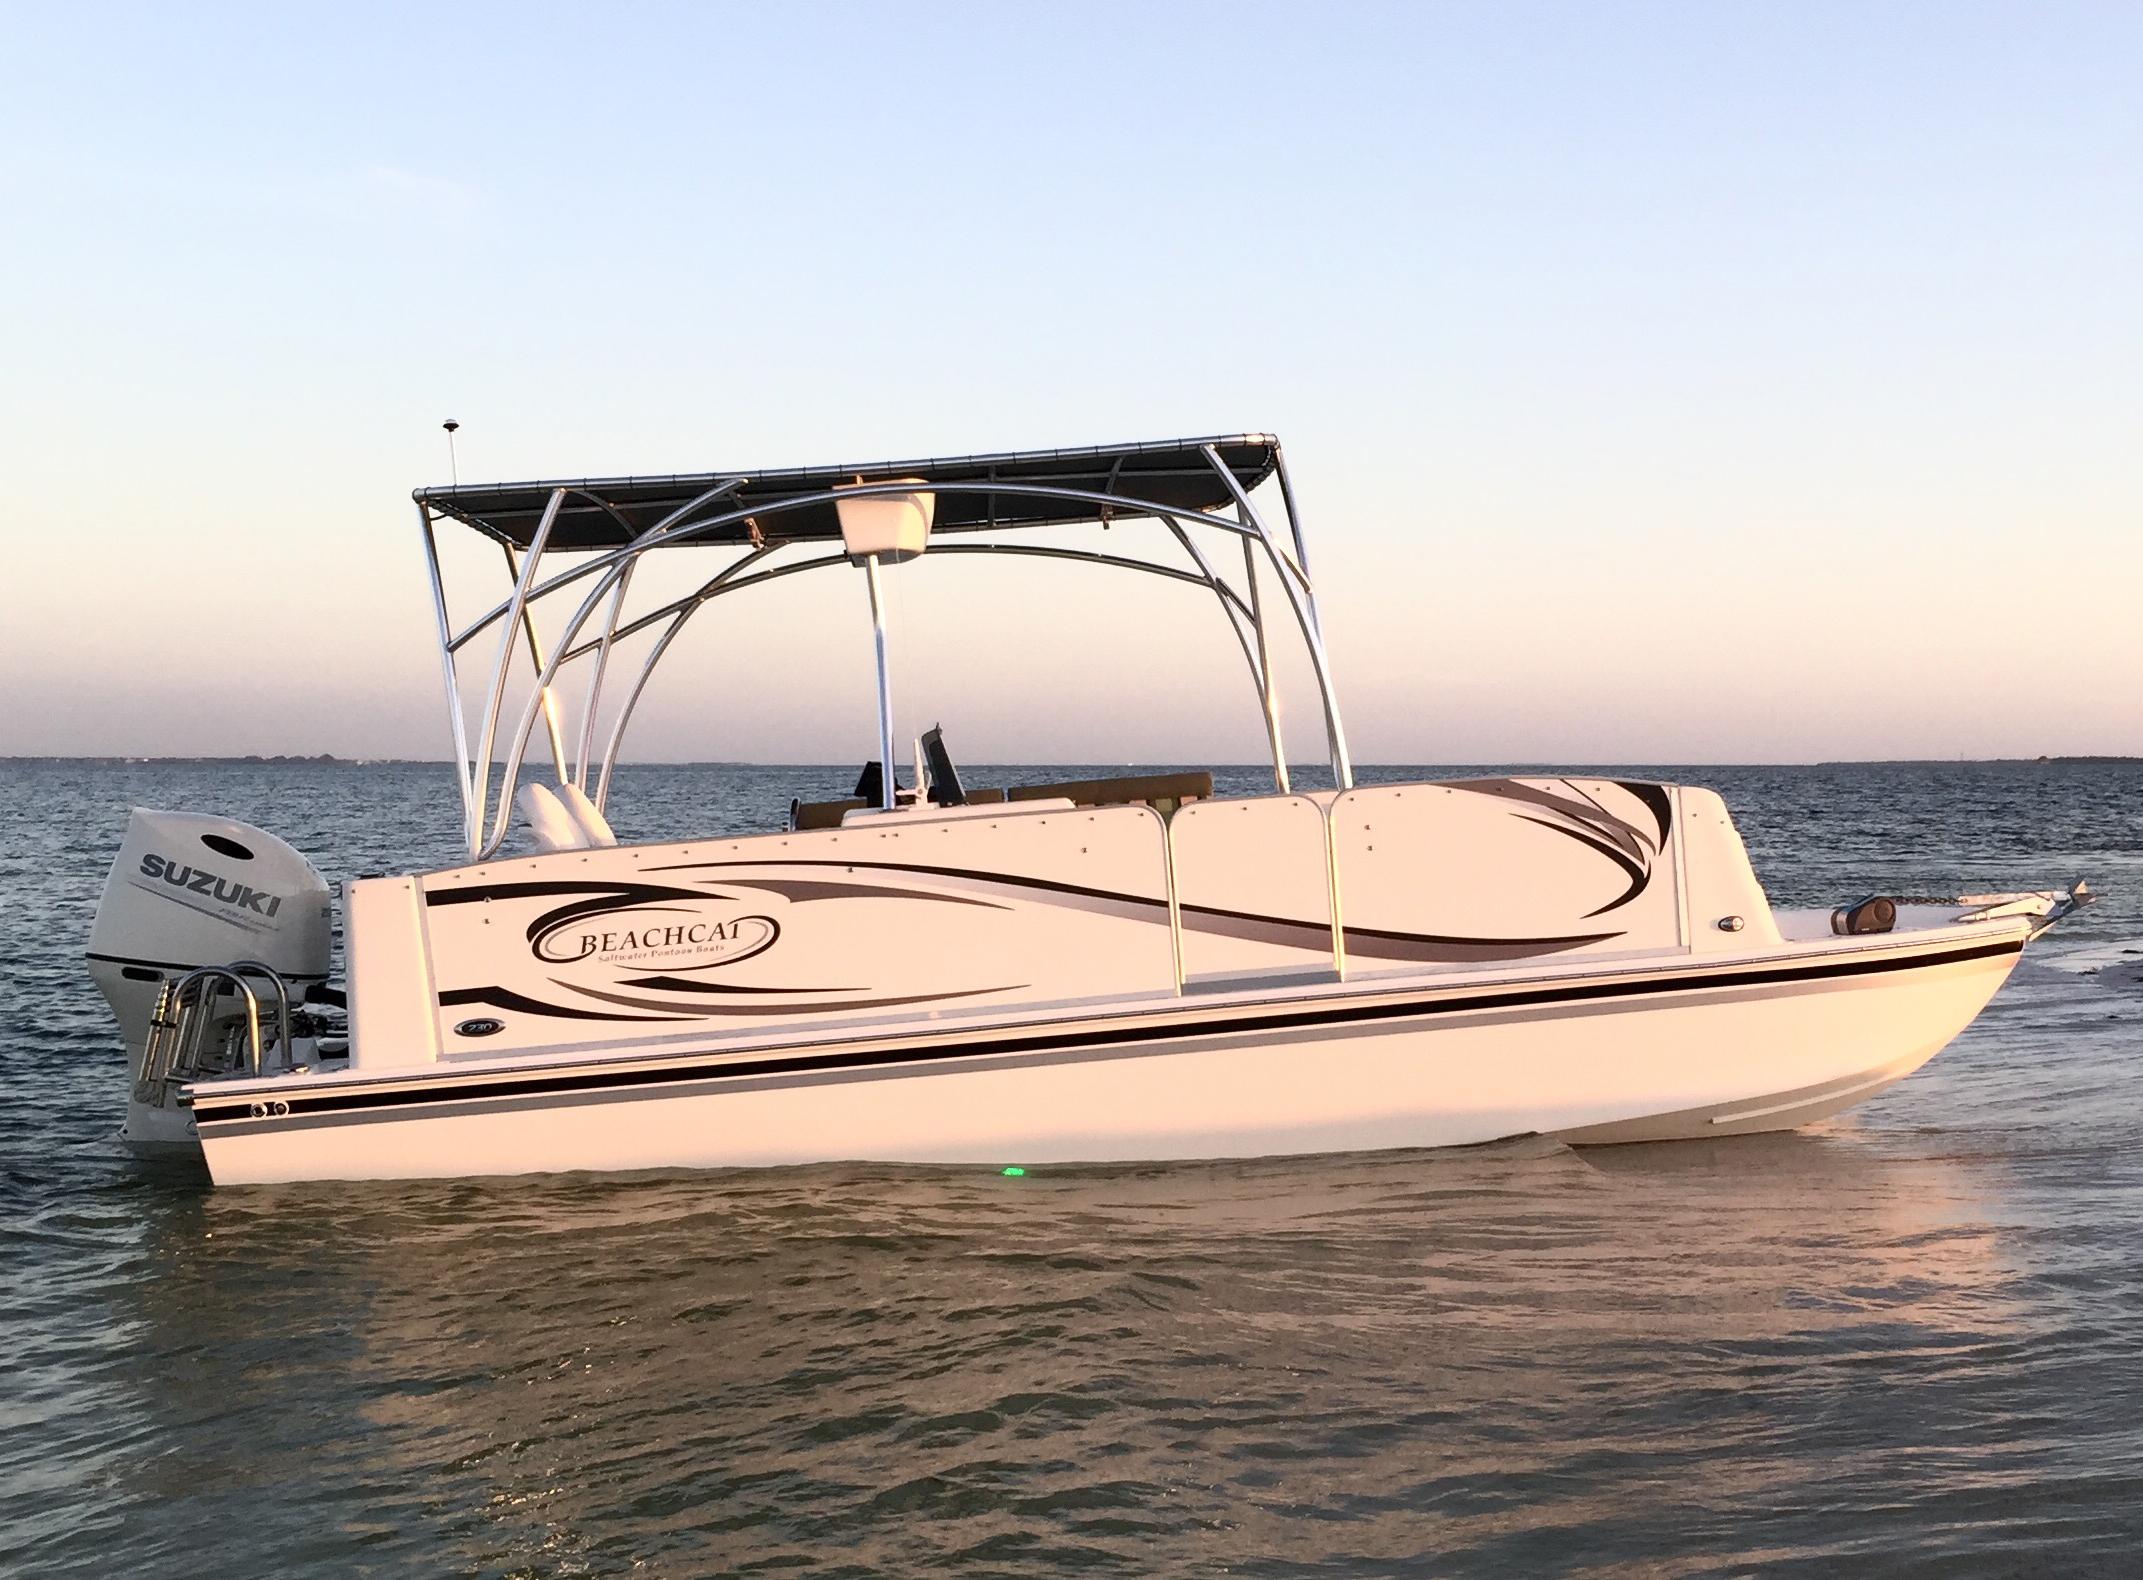 Fiberglass Series Beachcat Saltwater Pontoon Boats